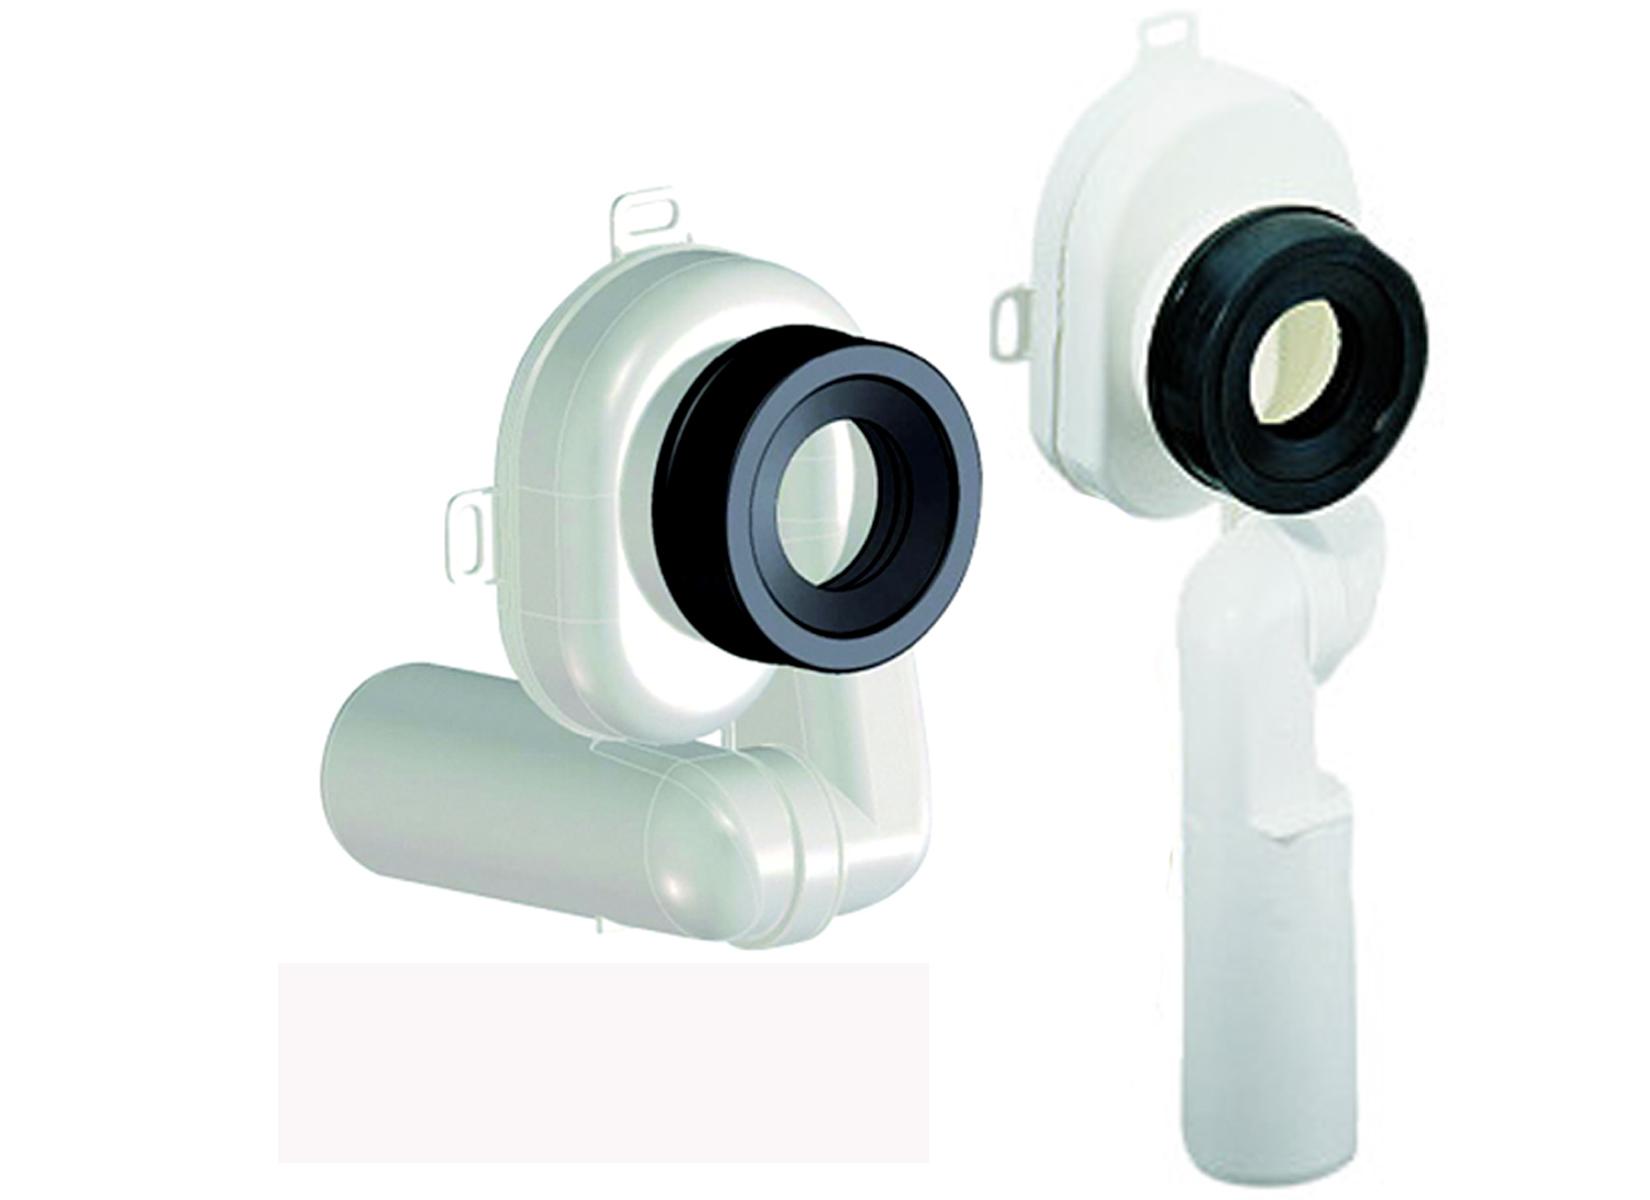 dallmer urinal absaugsiphon hl 430 siphon sifon urinalablauf geruchsverschluss ebay. Black Bedroom Furniture Sets. Home Design Ideas